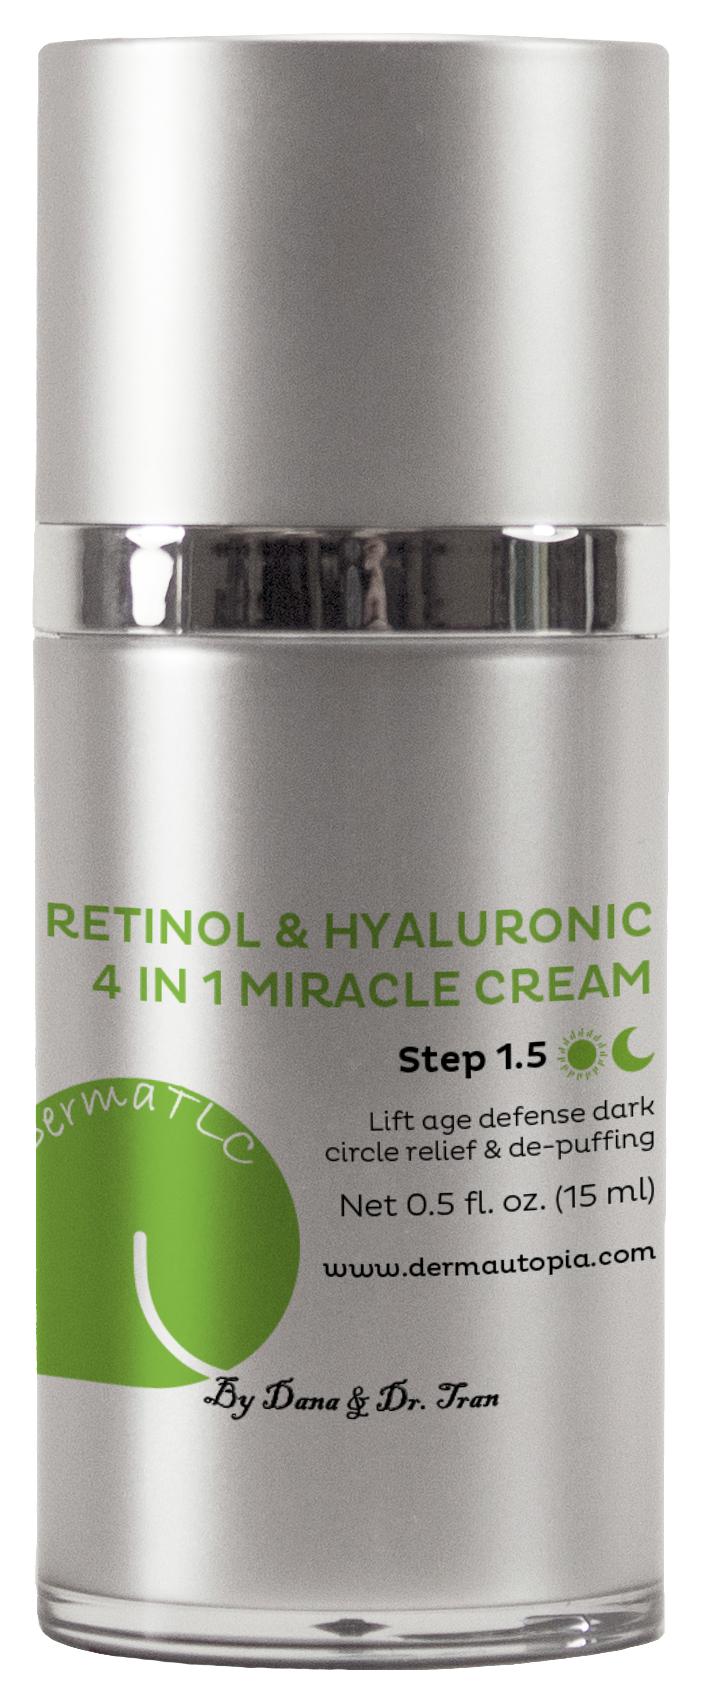 Retinol & Hyaluronic 4 in 1 Miracle Eye Cream